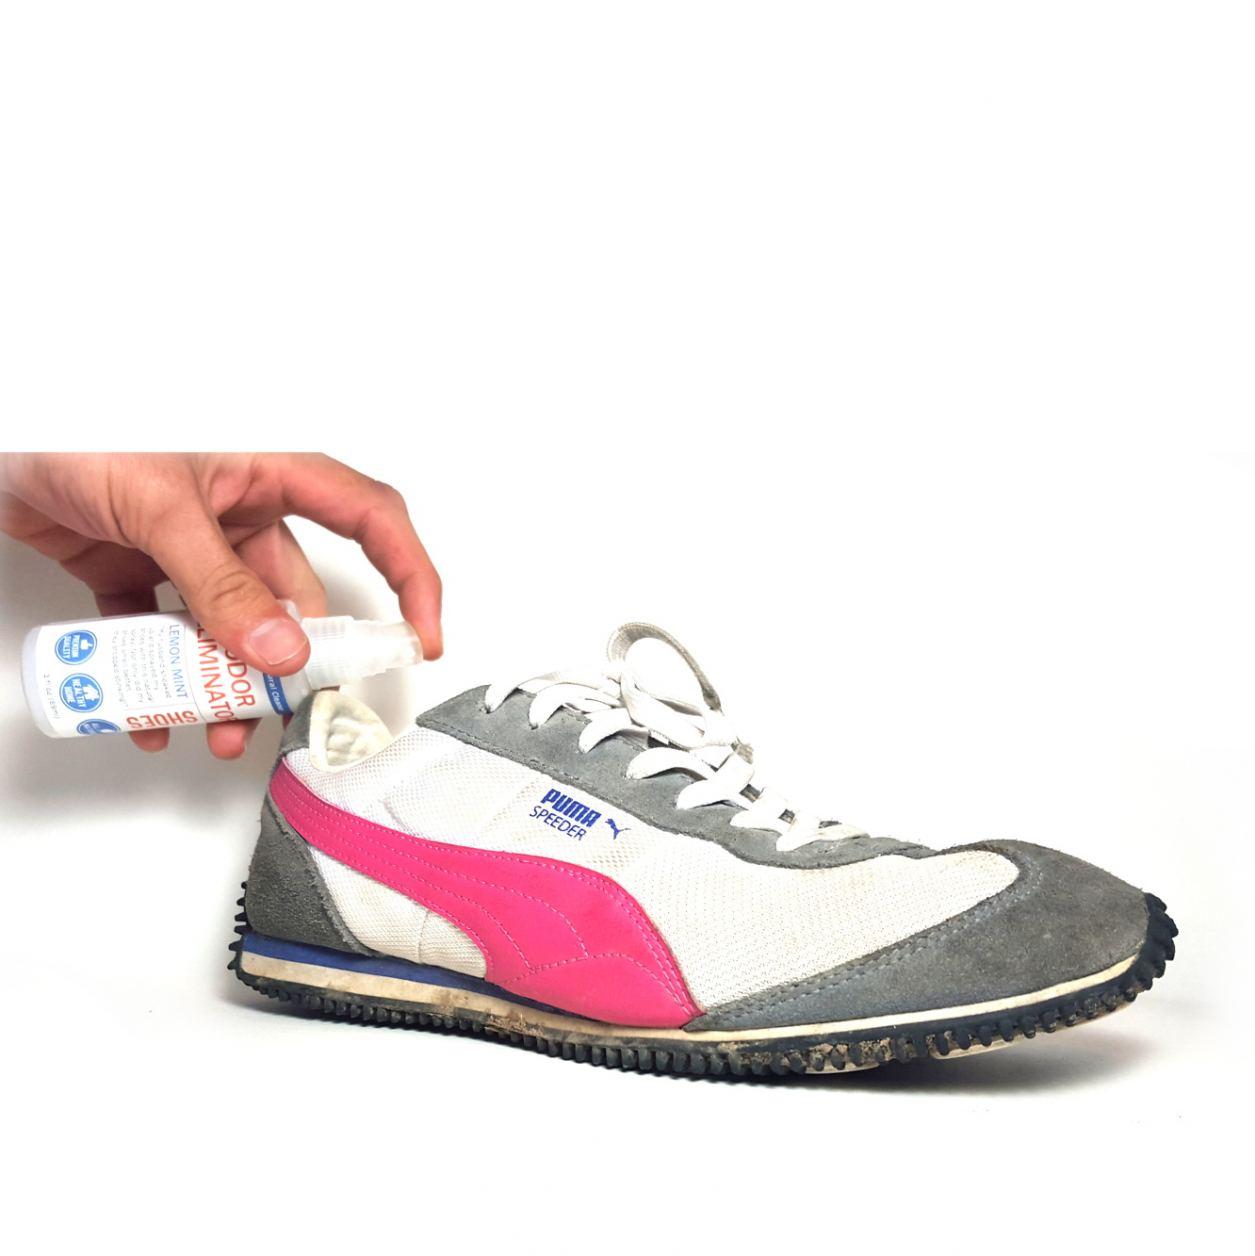 Best Foot Odor Eliminator Shoe